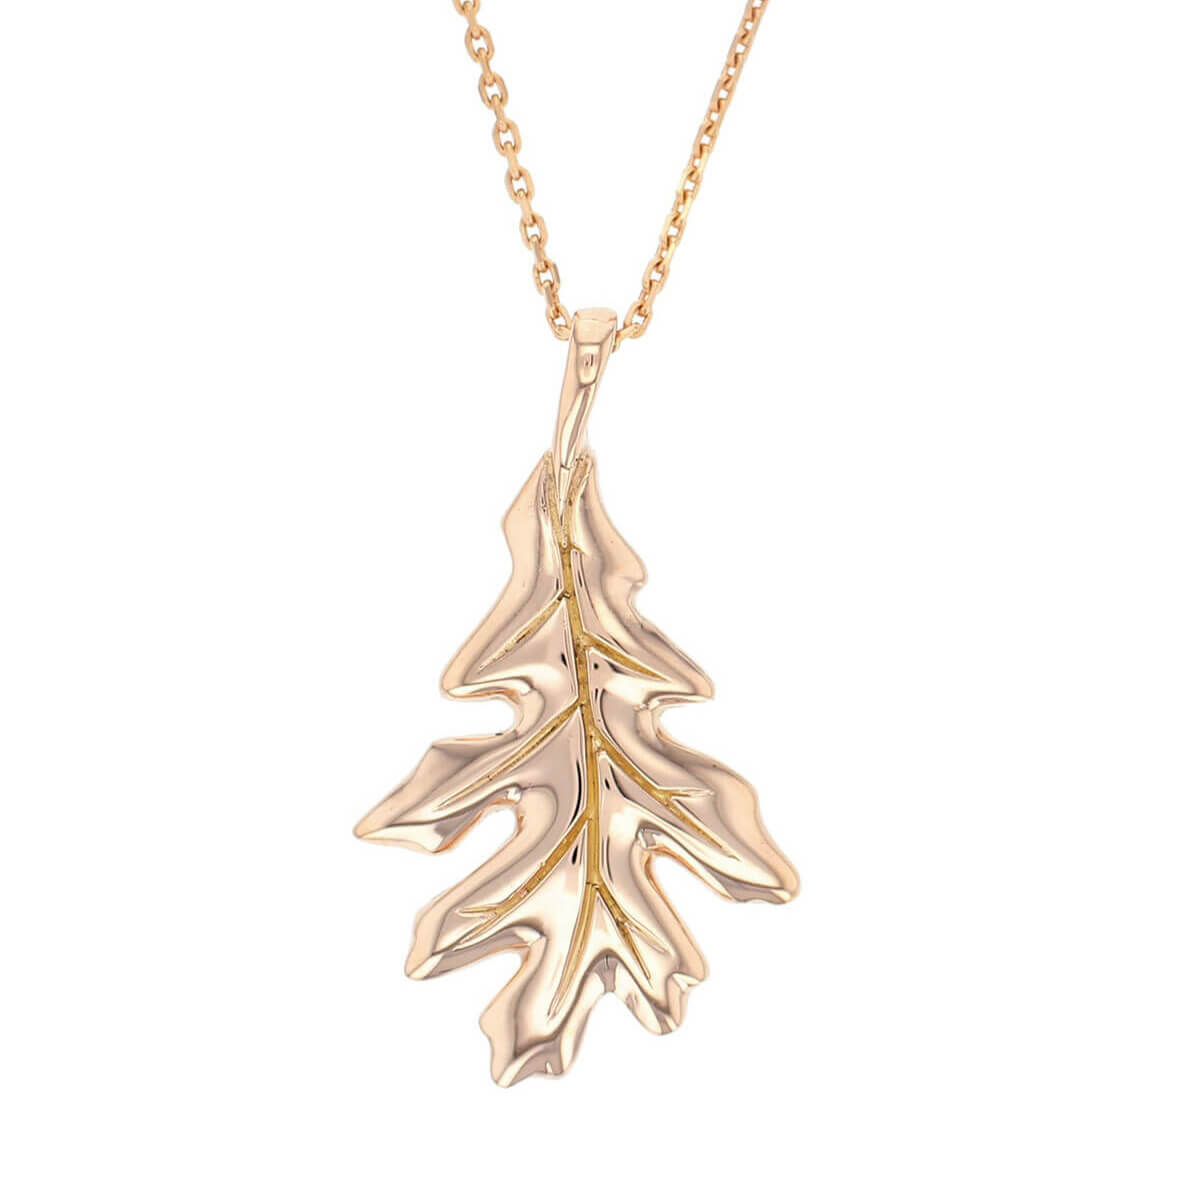 Faller Oakleaf, Derry, Londonderry, Northern Ireland, oak wood, acorn, angel, leaf, St Columba, St. Comcille, christian, heritage, historical, 18ct rose gold pendant